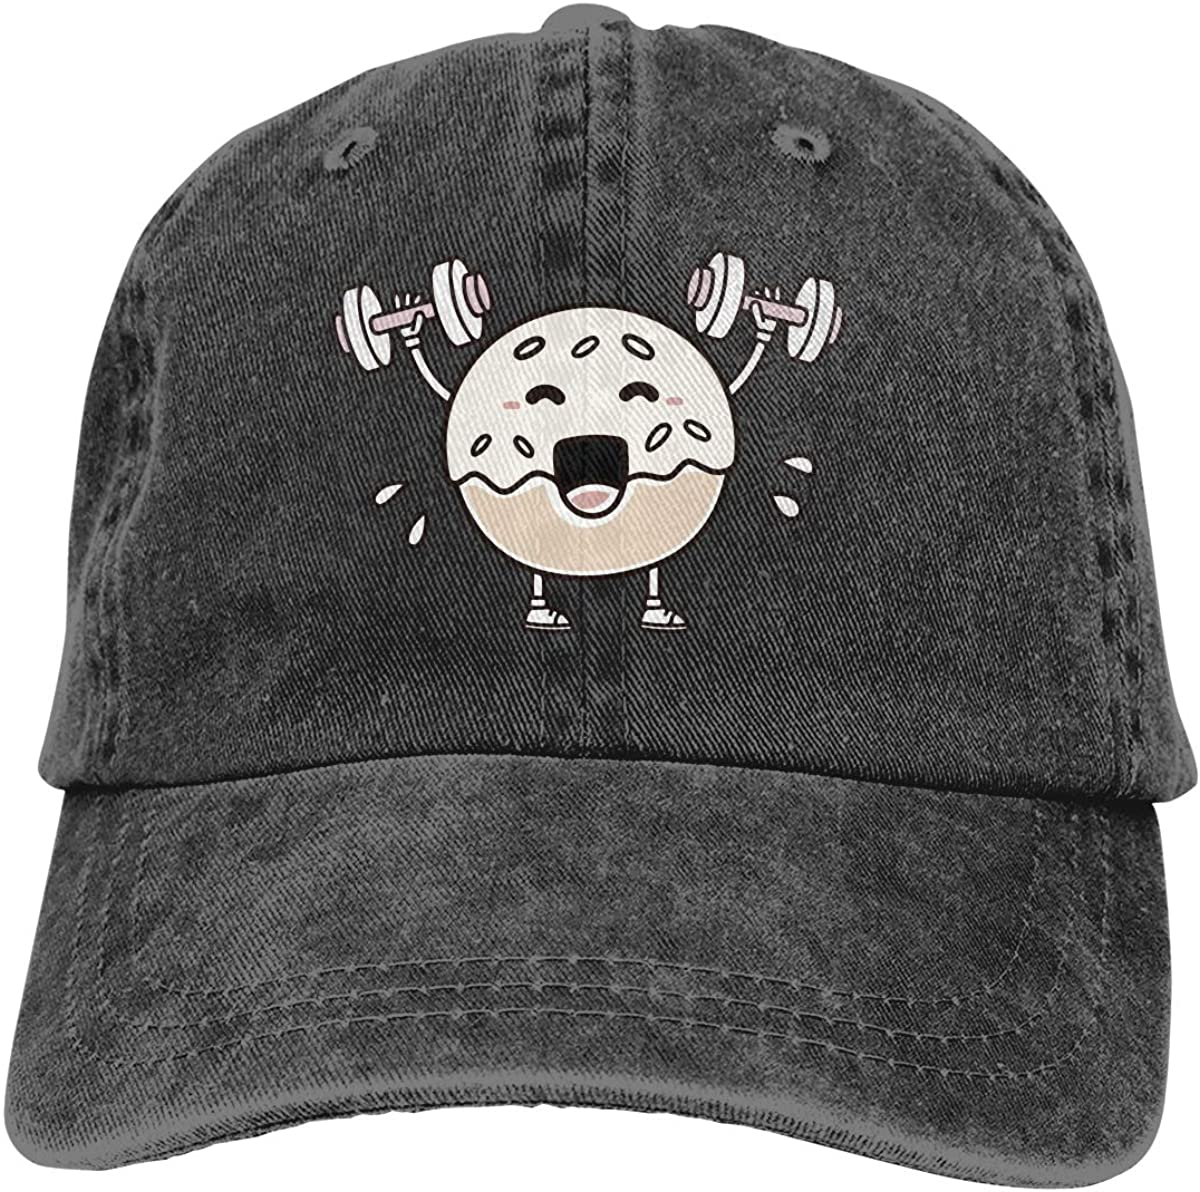 Tailing Donut Fitness Unisex Adjustable Cowboy Hat Baseball Cap for Sport